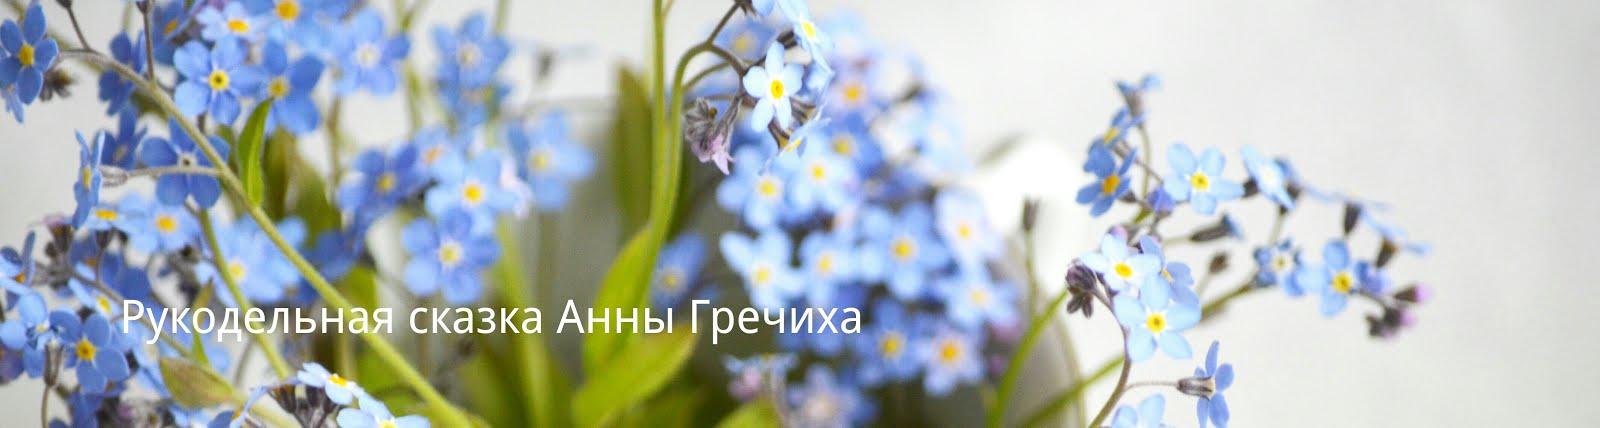 Рукодельная сказка Анны Гречиха